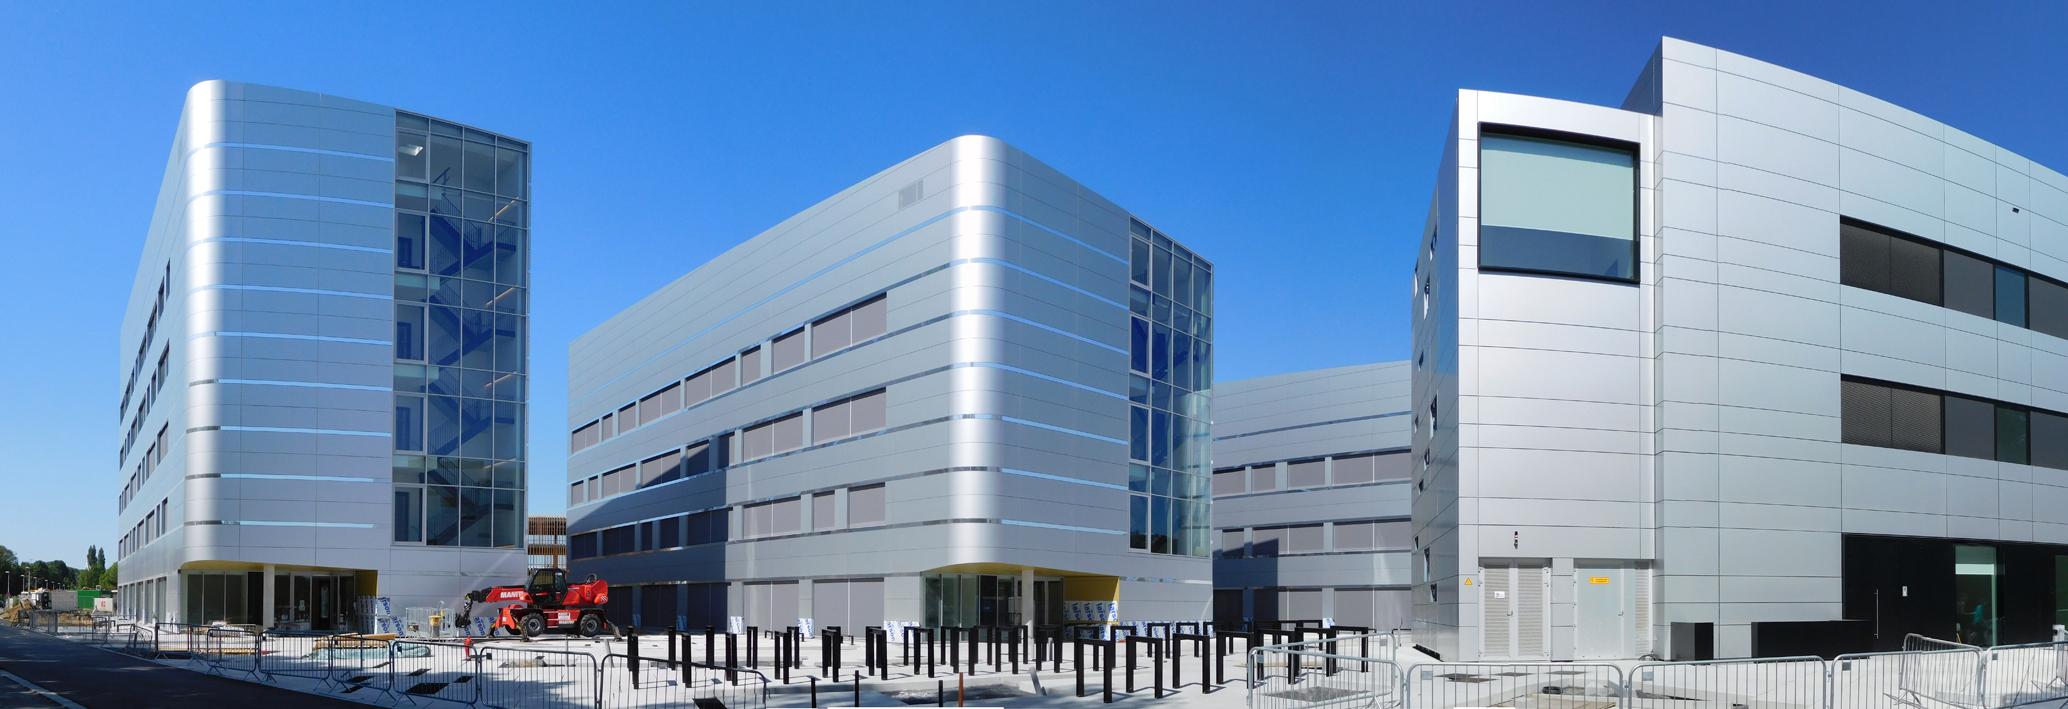 Bioscape, bio-tech gebouwen